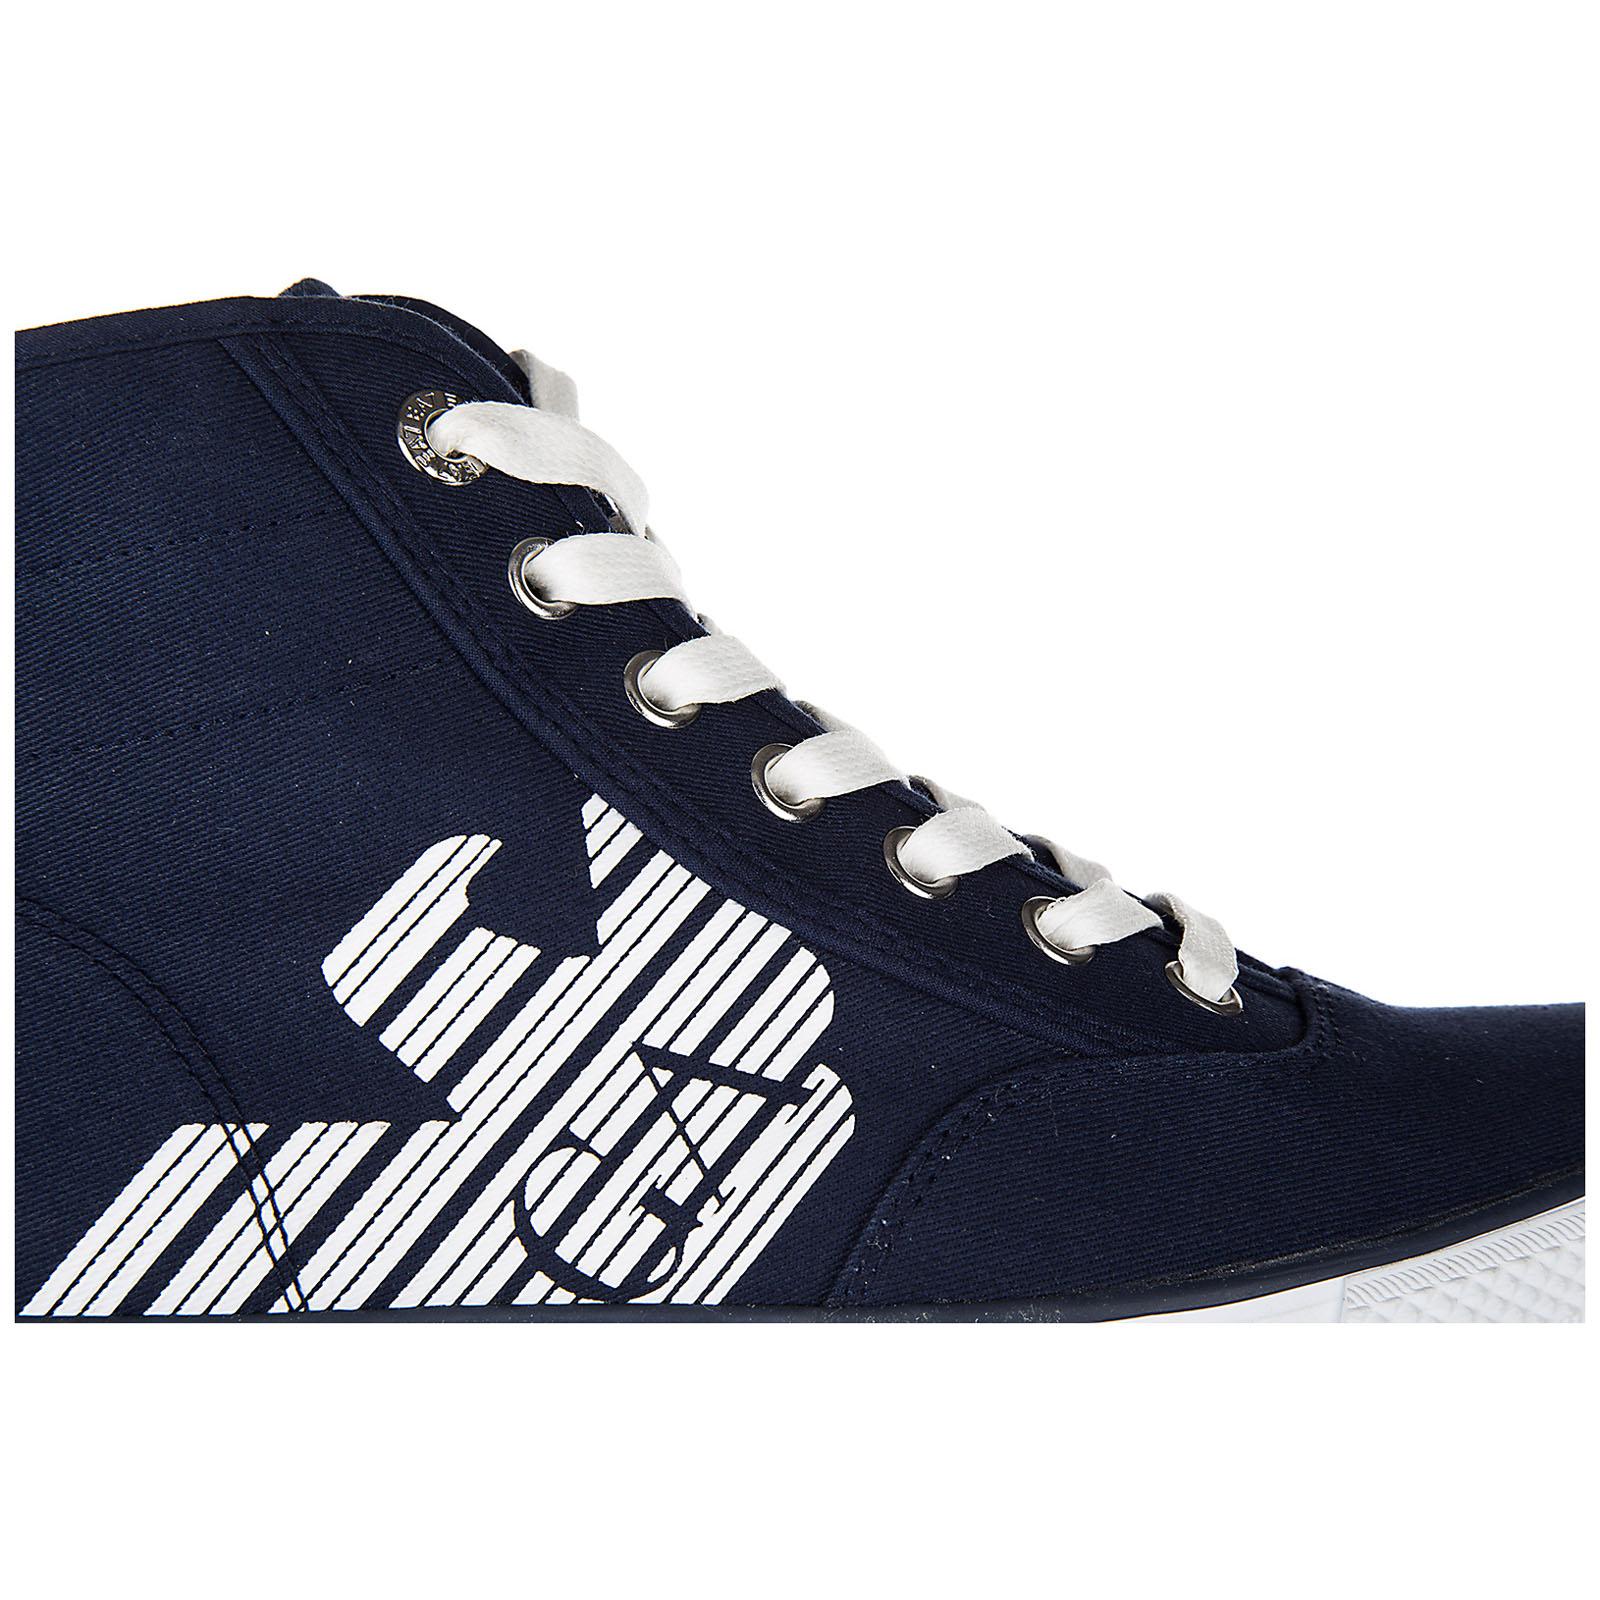 Scarpe sneakers alte donna  cult vintage